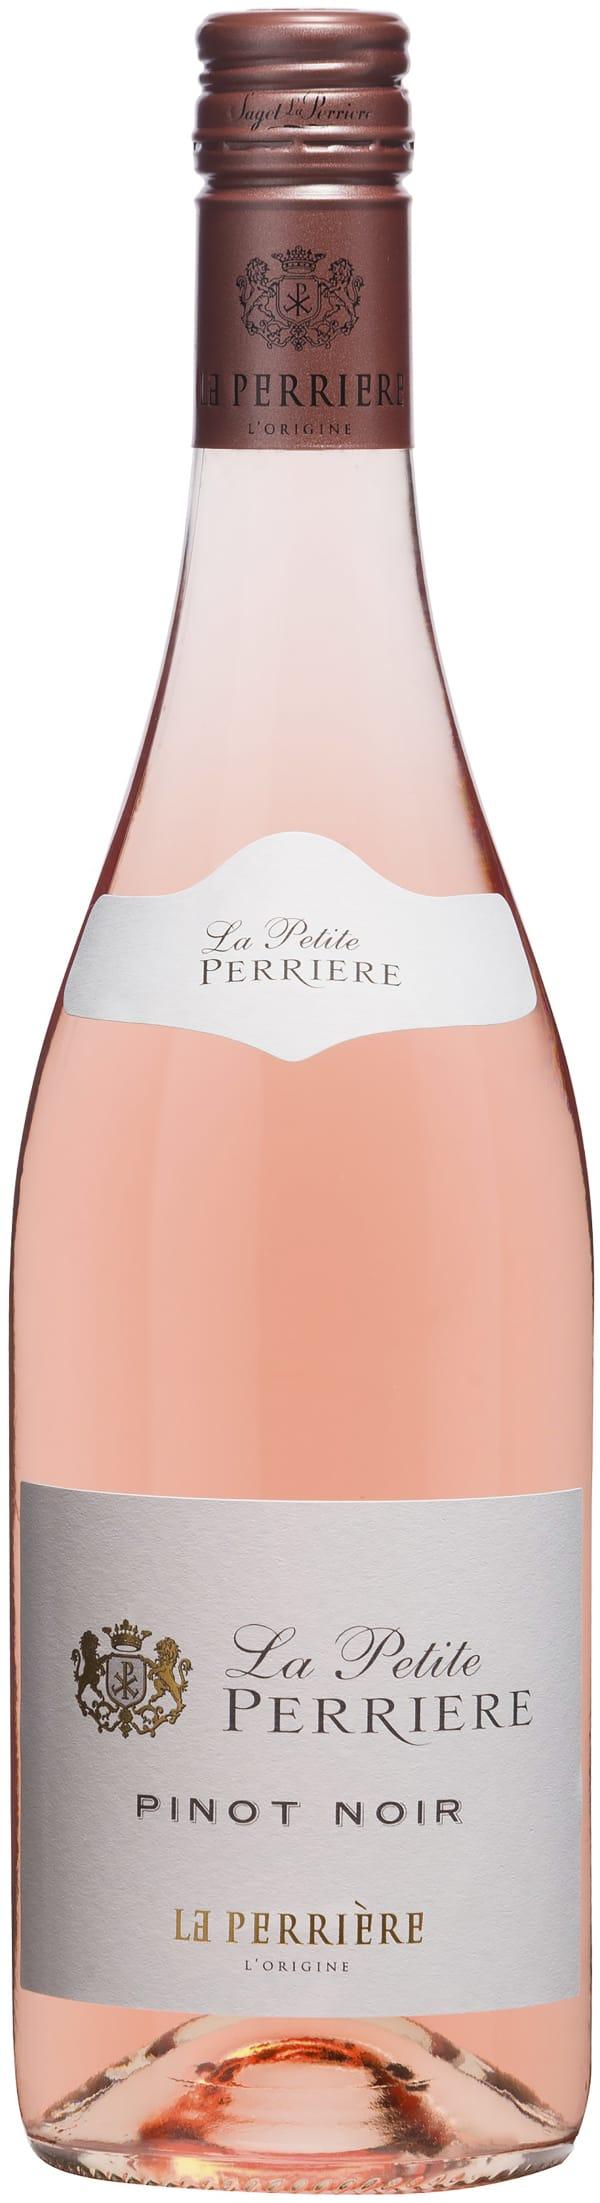 La Petite Perriere Rose Pinot Noir 2017